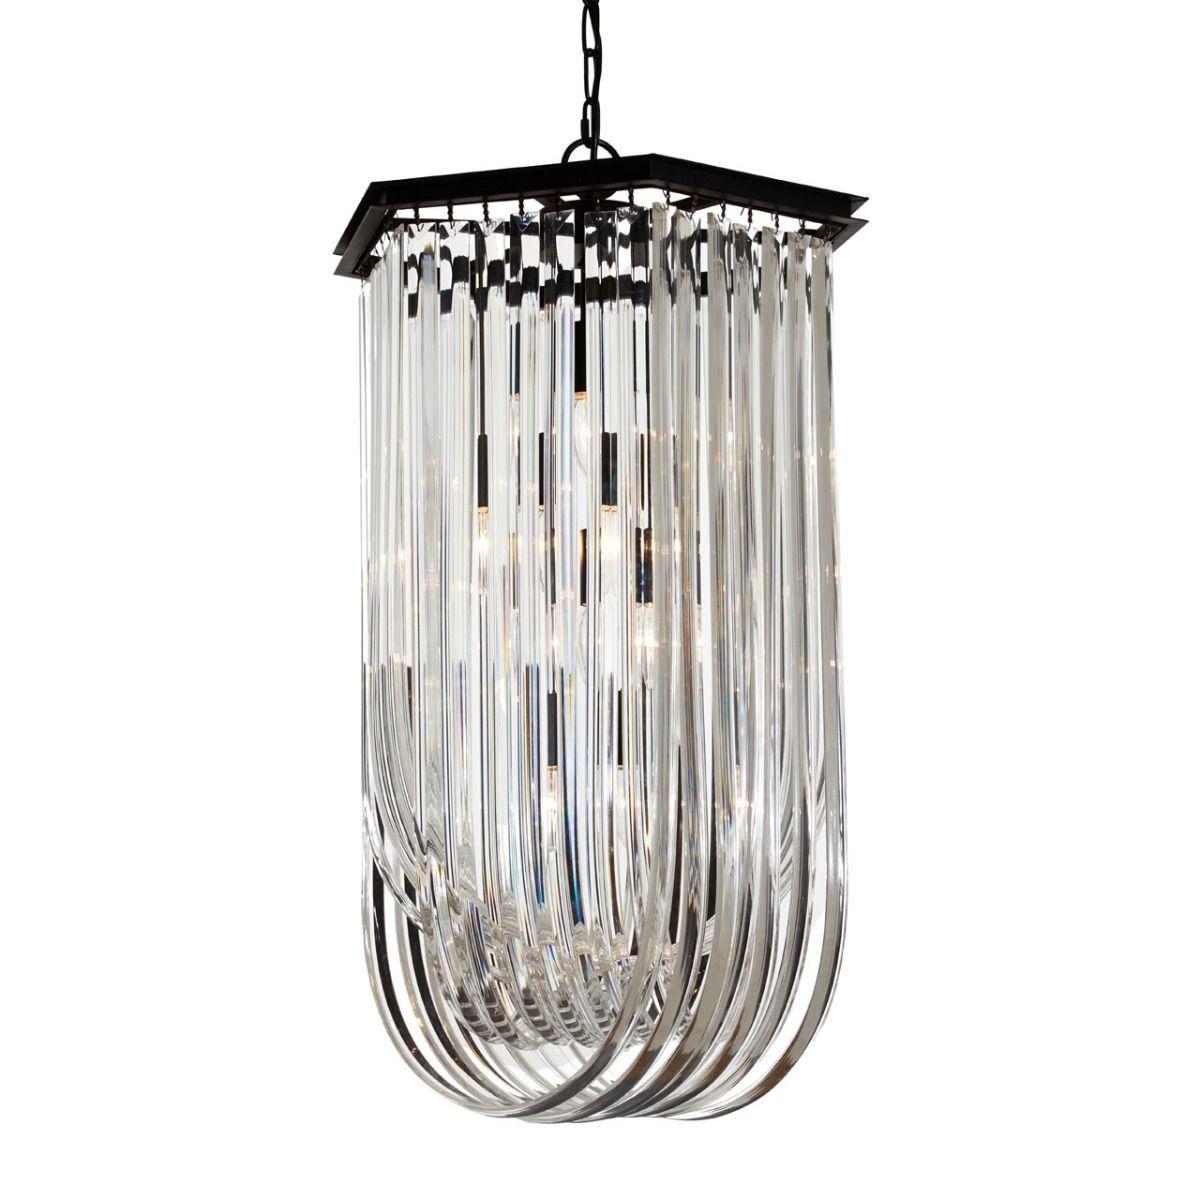 Waldorf Ceiling Light - 130cm